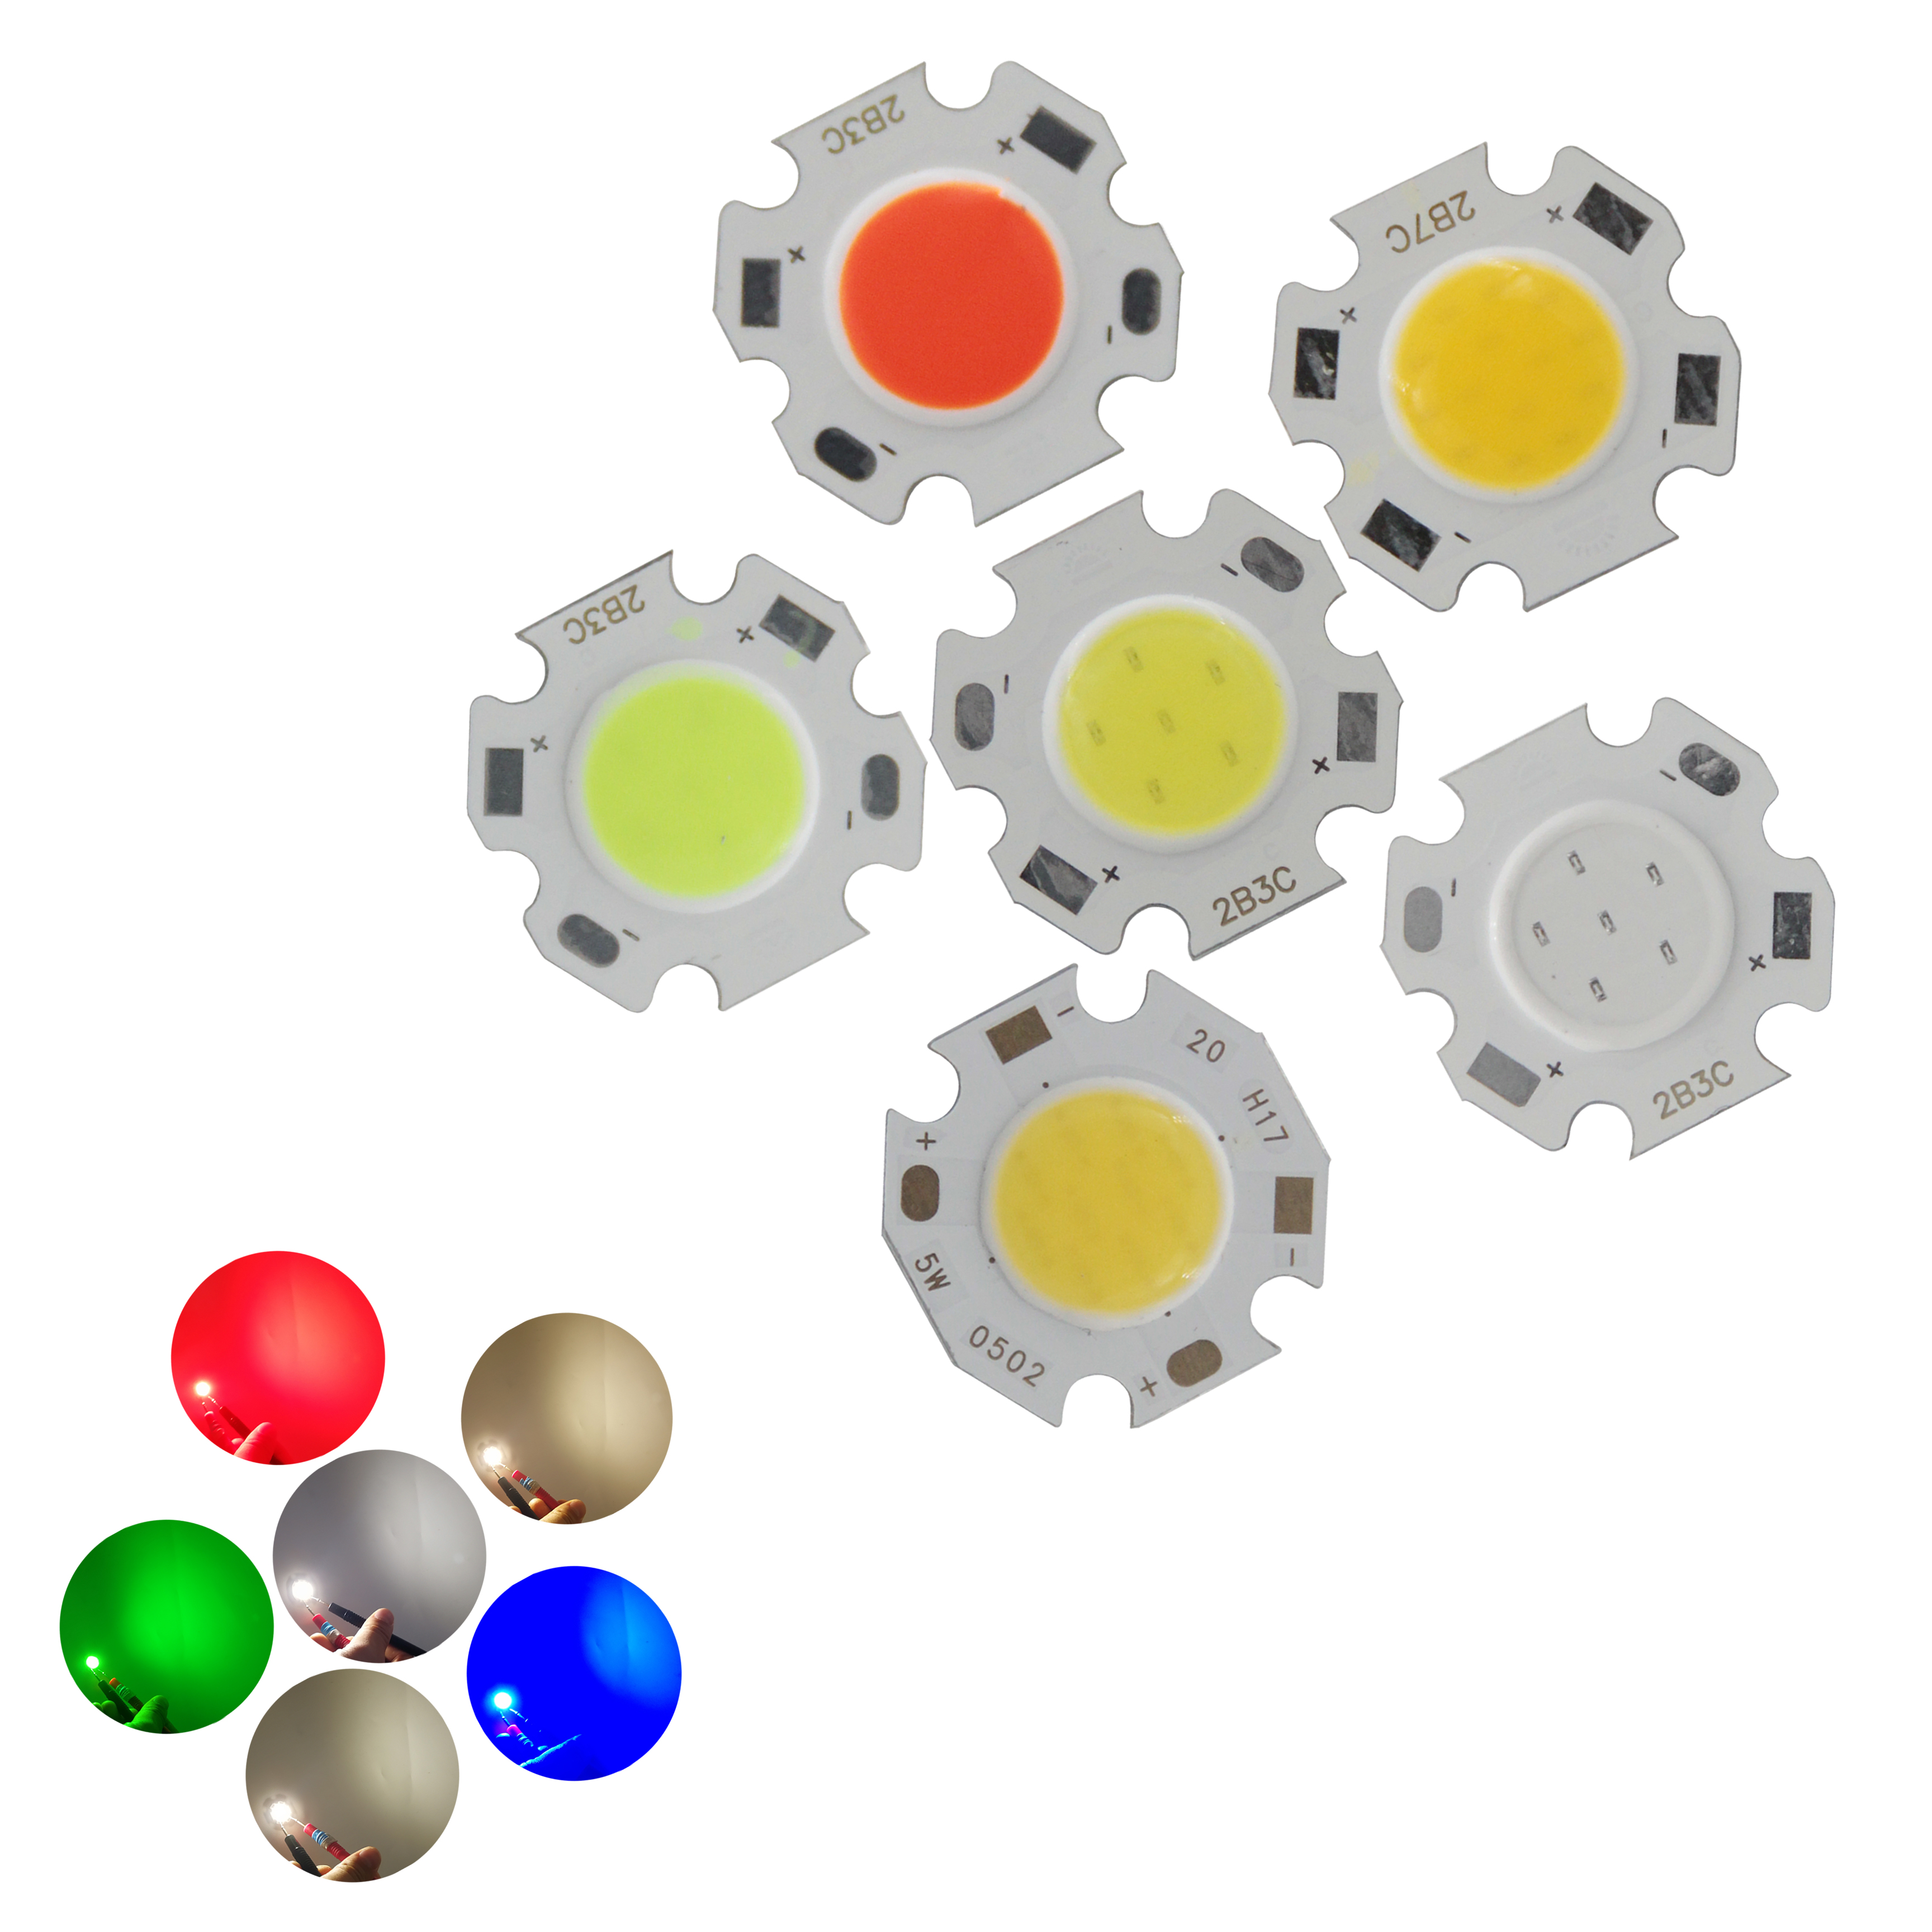 Big Promotion 20mm 11mm Round LED COB Light Source Module 3W 5W 7W Warm Nature White R G B COB Bulb Flip Chips For Spot Light